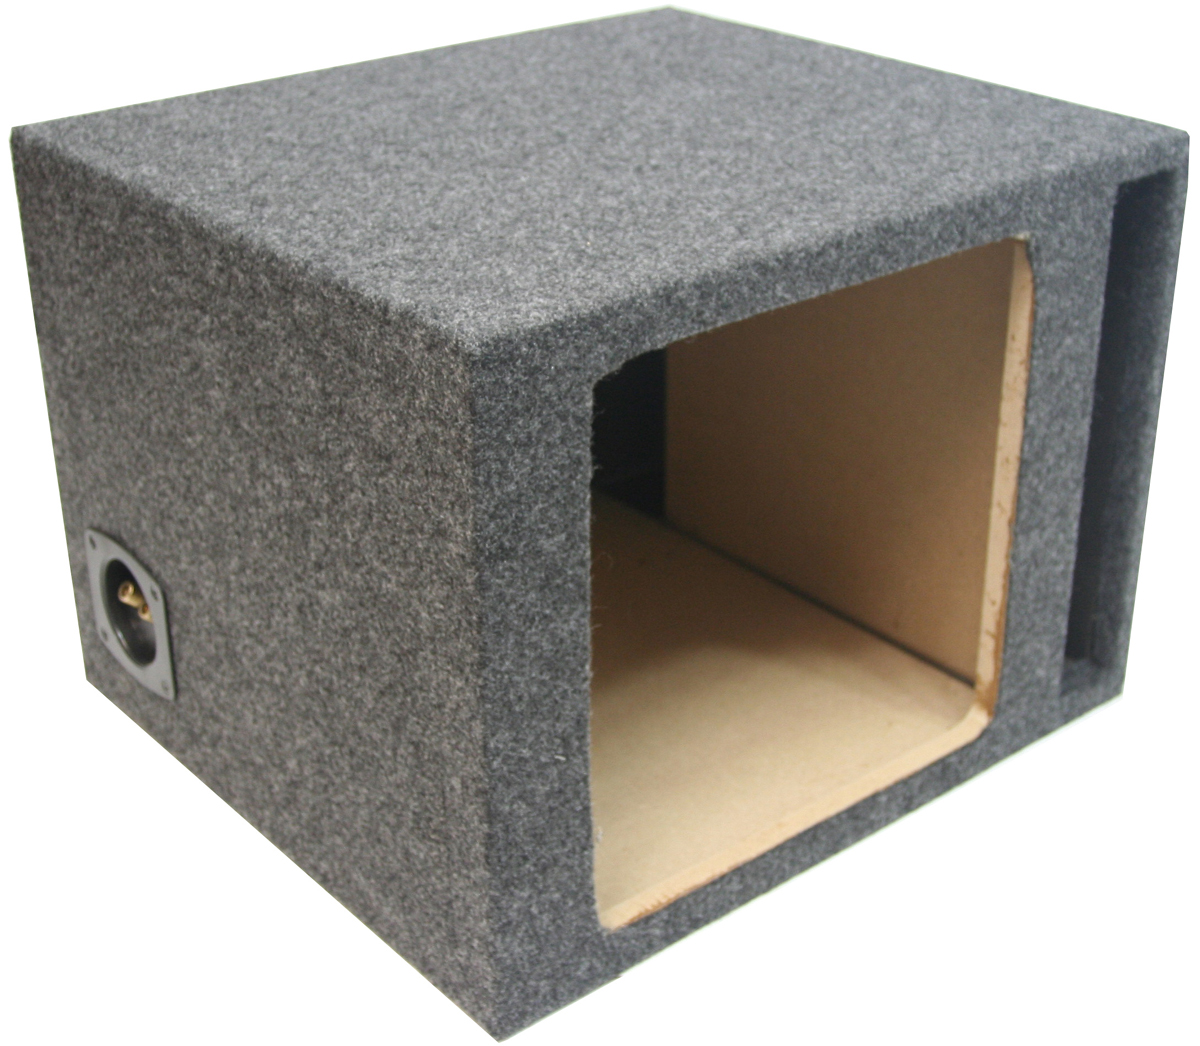 single 10 ported kicker square sub box enclosure 110sqv. Black Bedroom Furniture Sets. Home Design Ideas